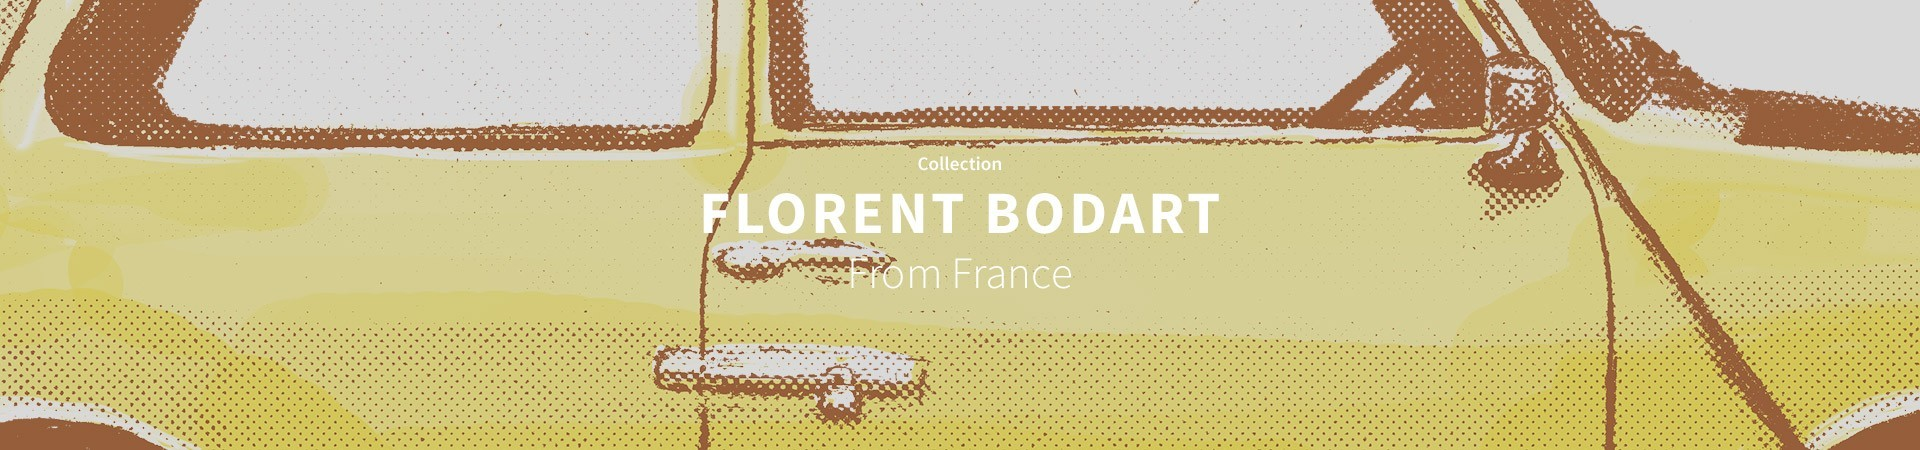 Florent Bodart